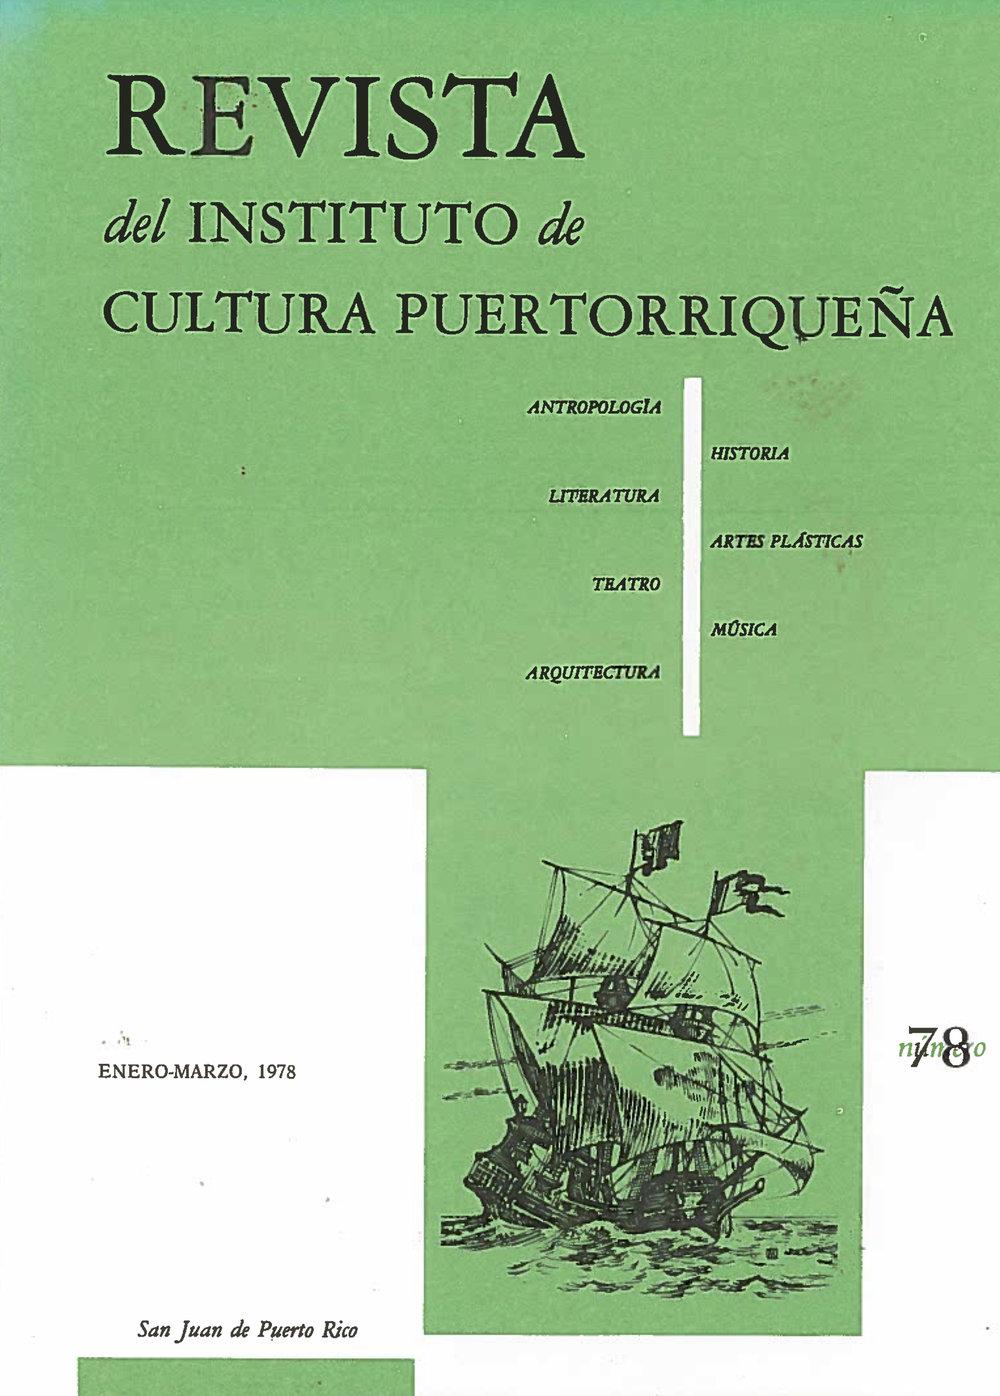 Número 78 / 1978